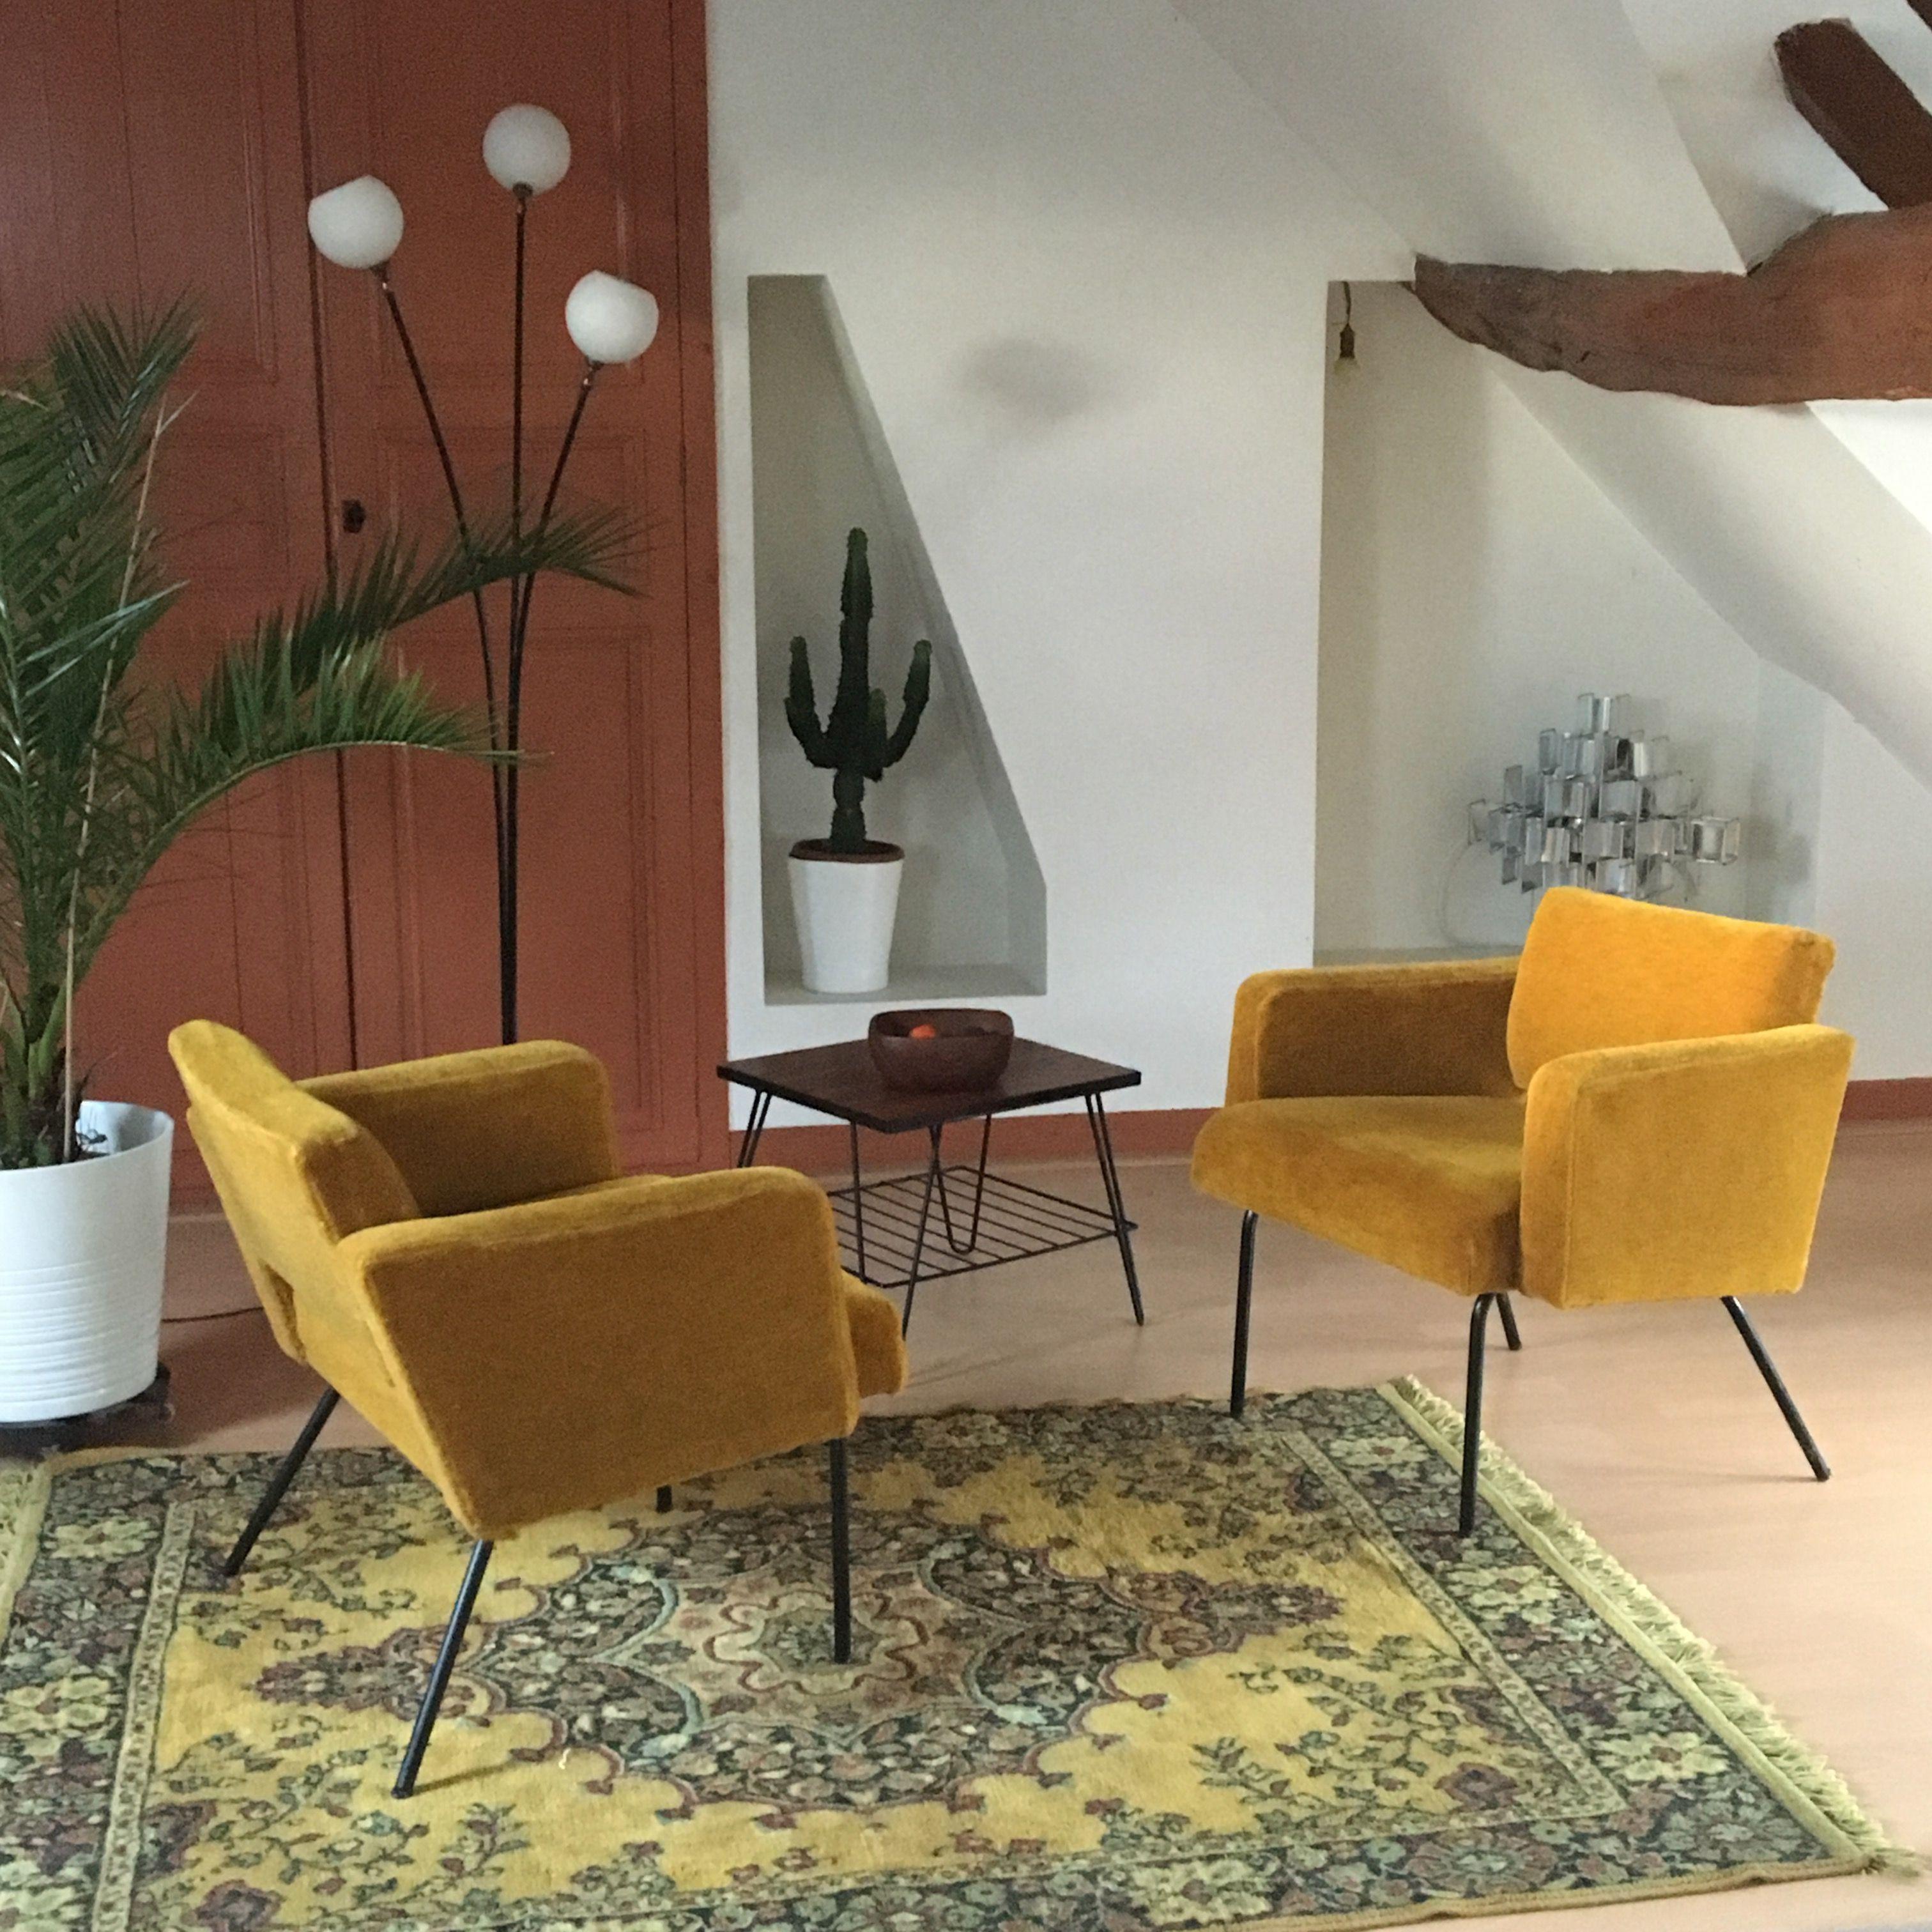 Fauteuil Vintage Jaune Moutarde Salon Scandinave Scandinavian  # Meuble Tv Moutarde